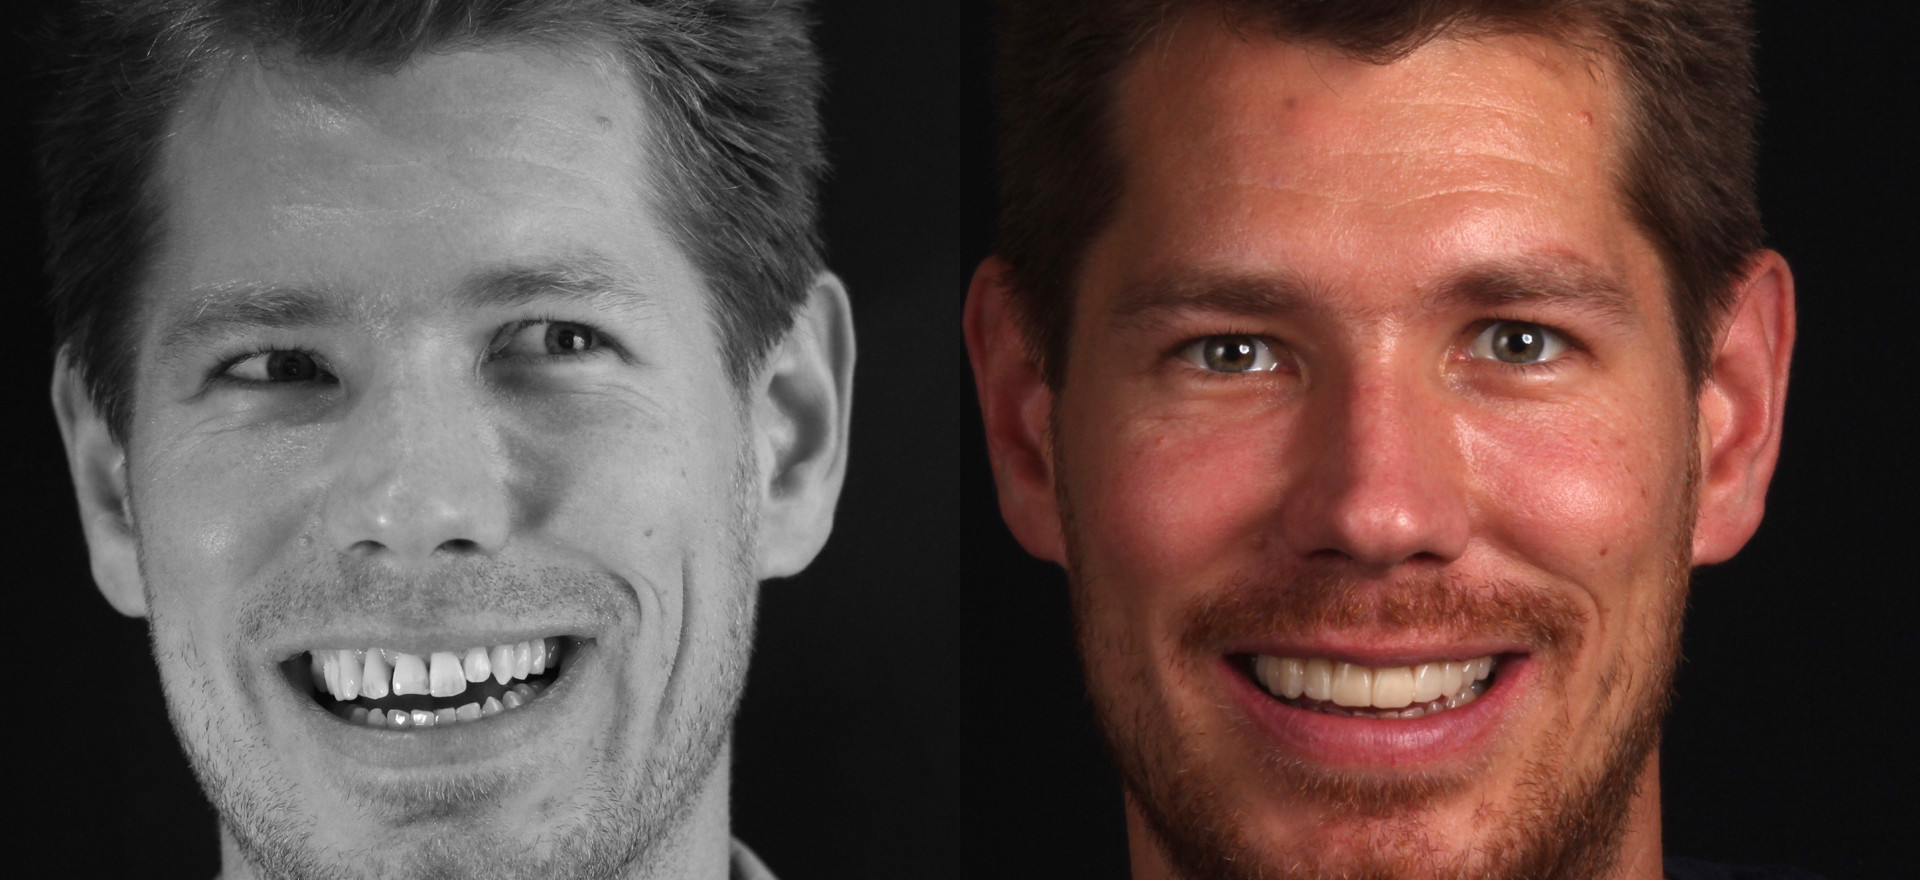 Enhancing a smile with Digital Smile Design